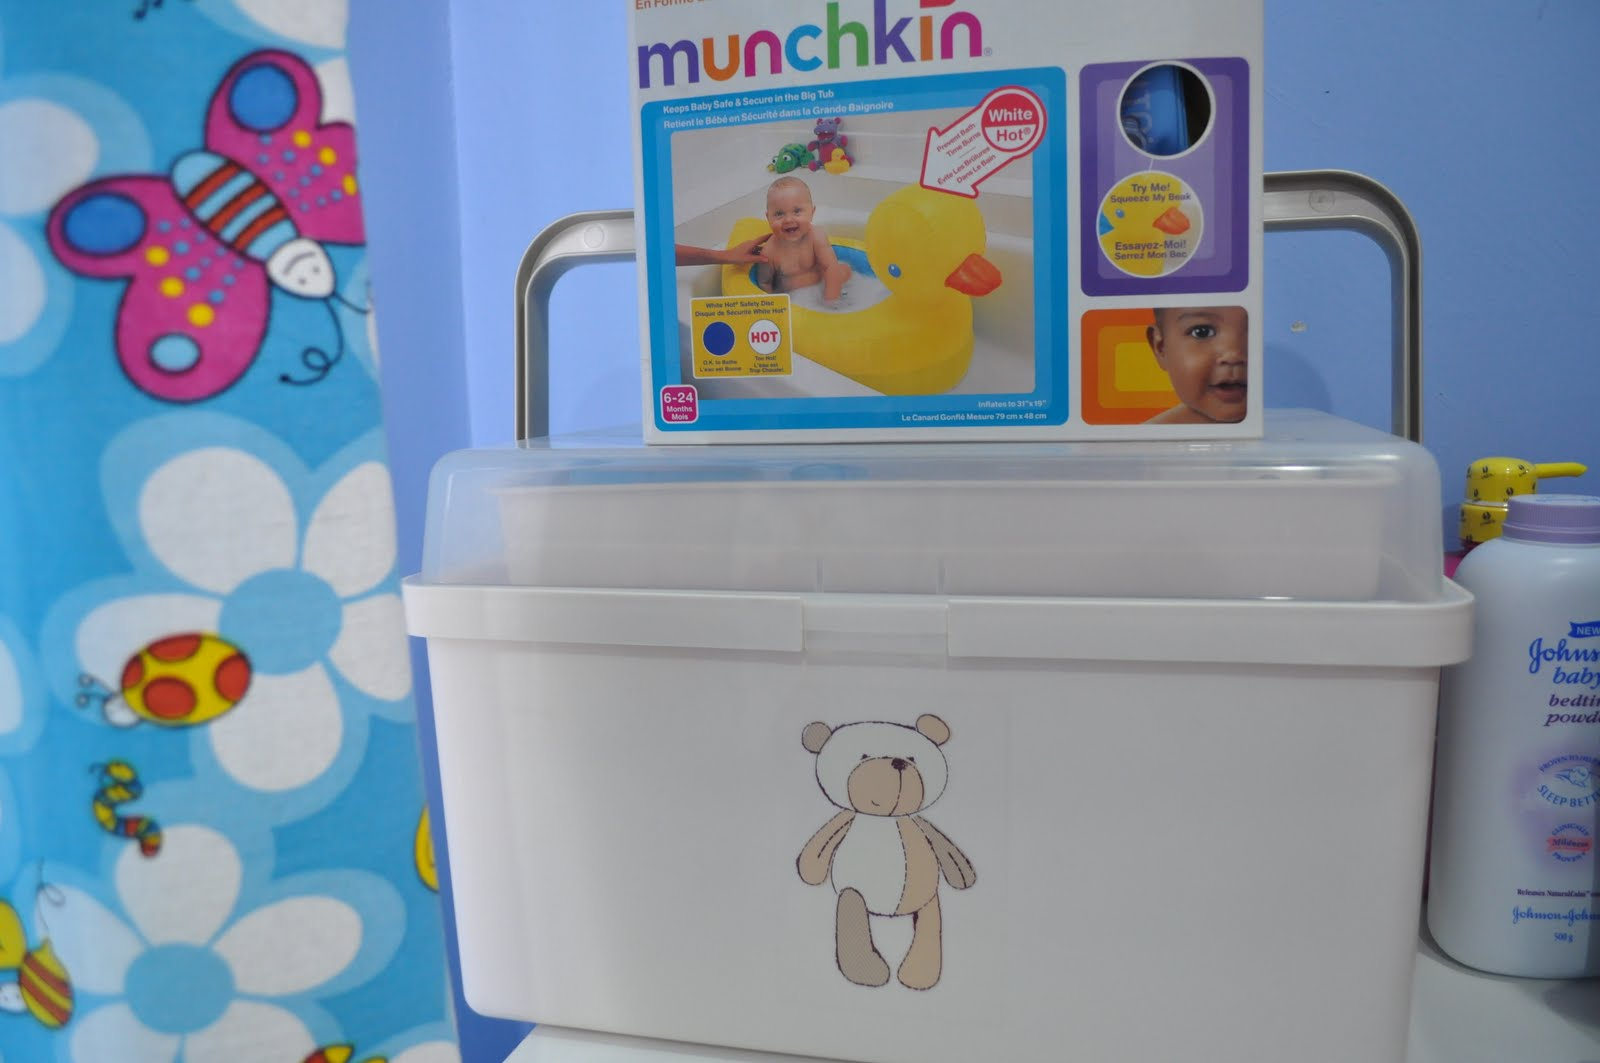 I Me Amp Myself Senarai Semak Baby Checklist Buat Budak